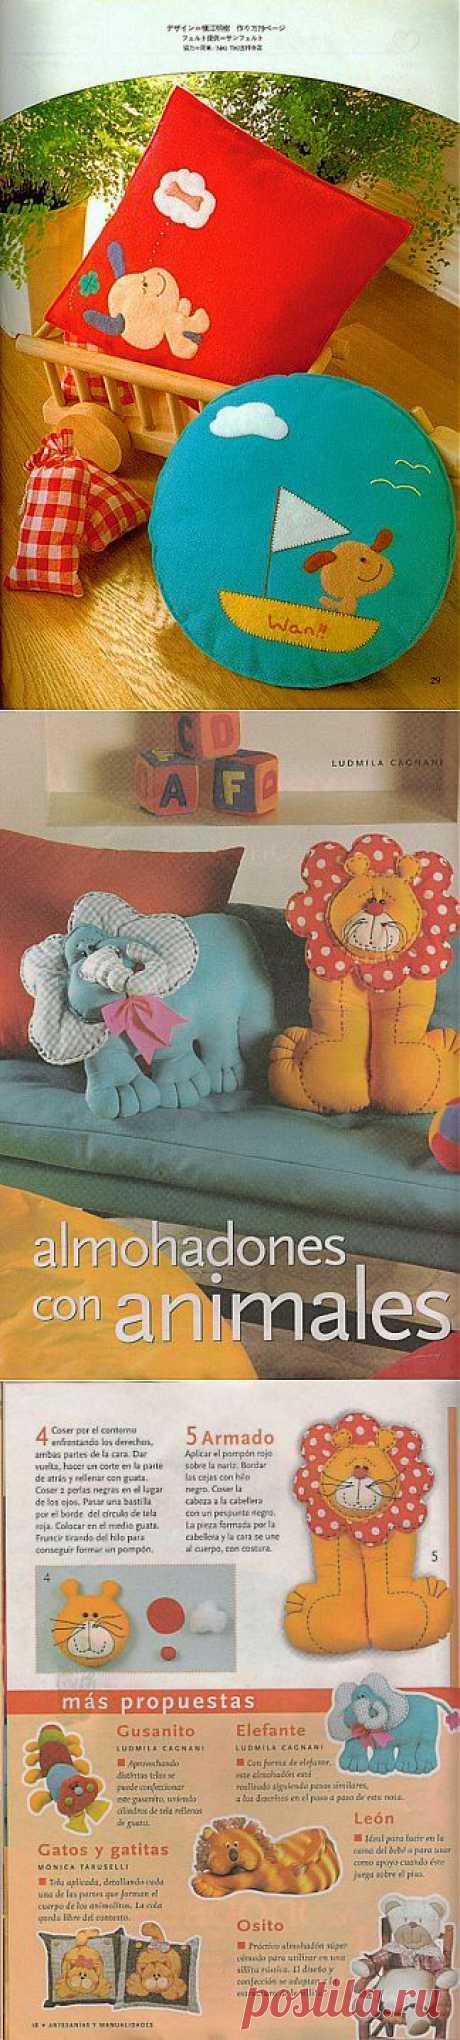 ¡Las almohadas entretenidas infantiles!.